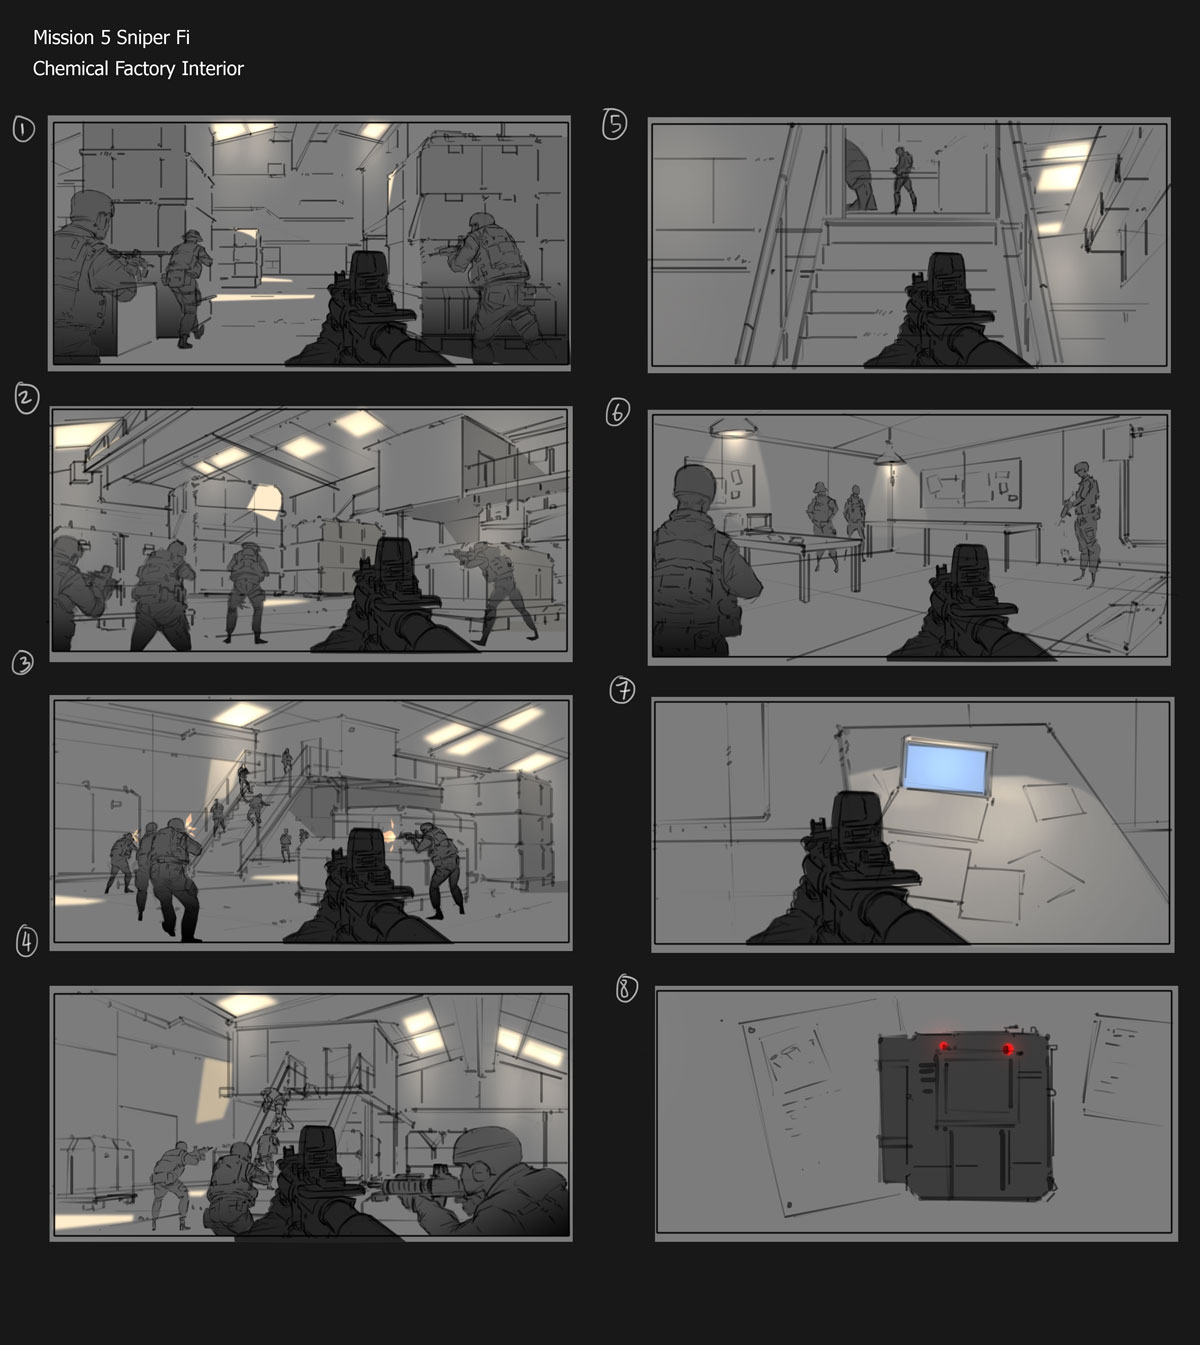 Sniper_fi_Chemical_Factory_Interior_Storyboard.jpg